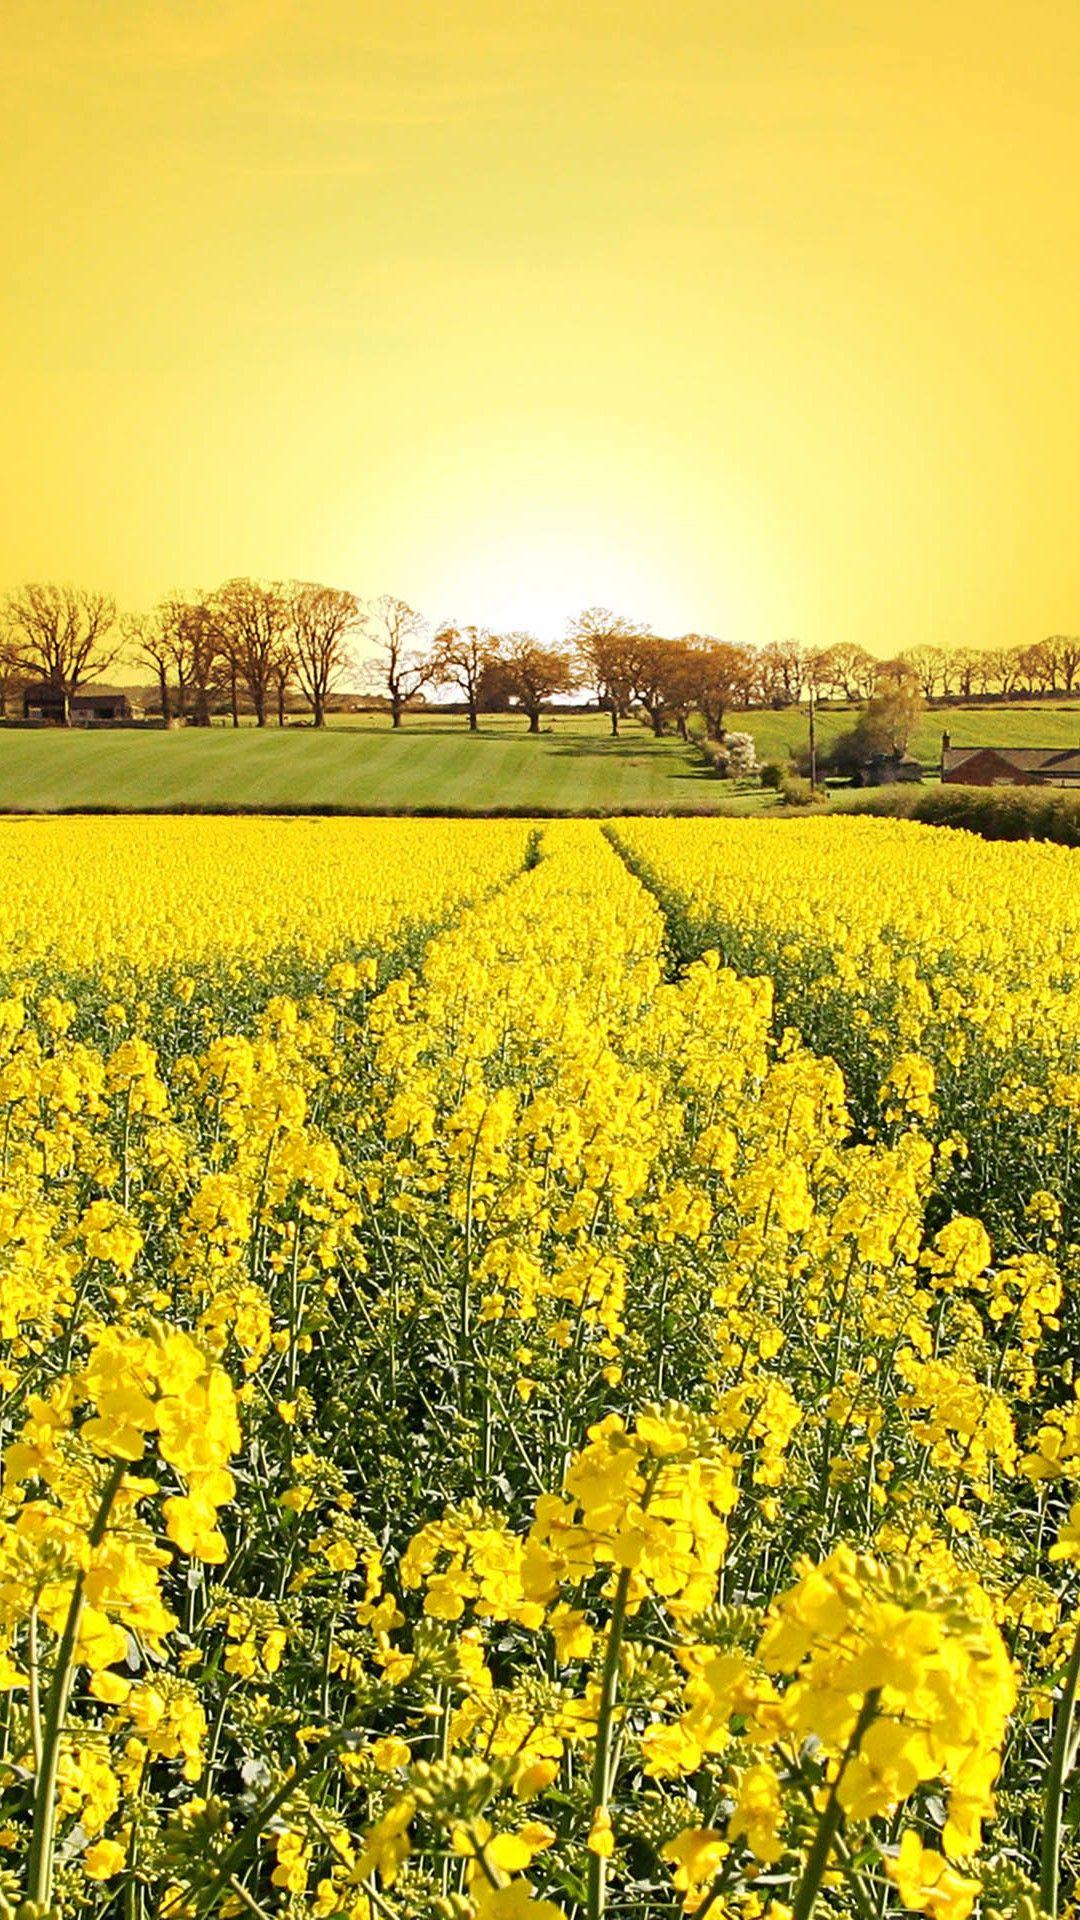 Golden Canola Flowers iPhone 8 Wallpapers Yellow fields